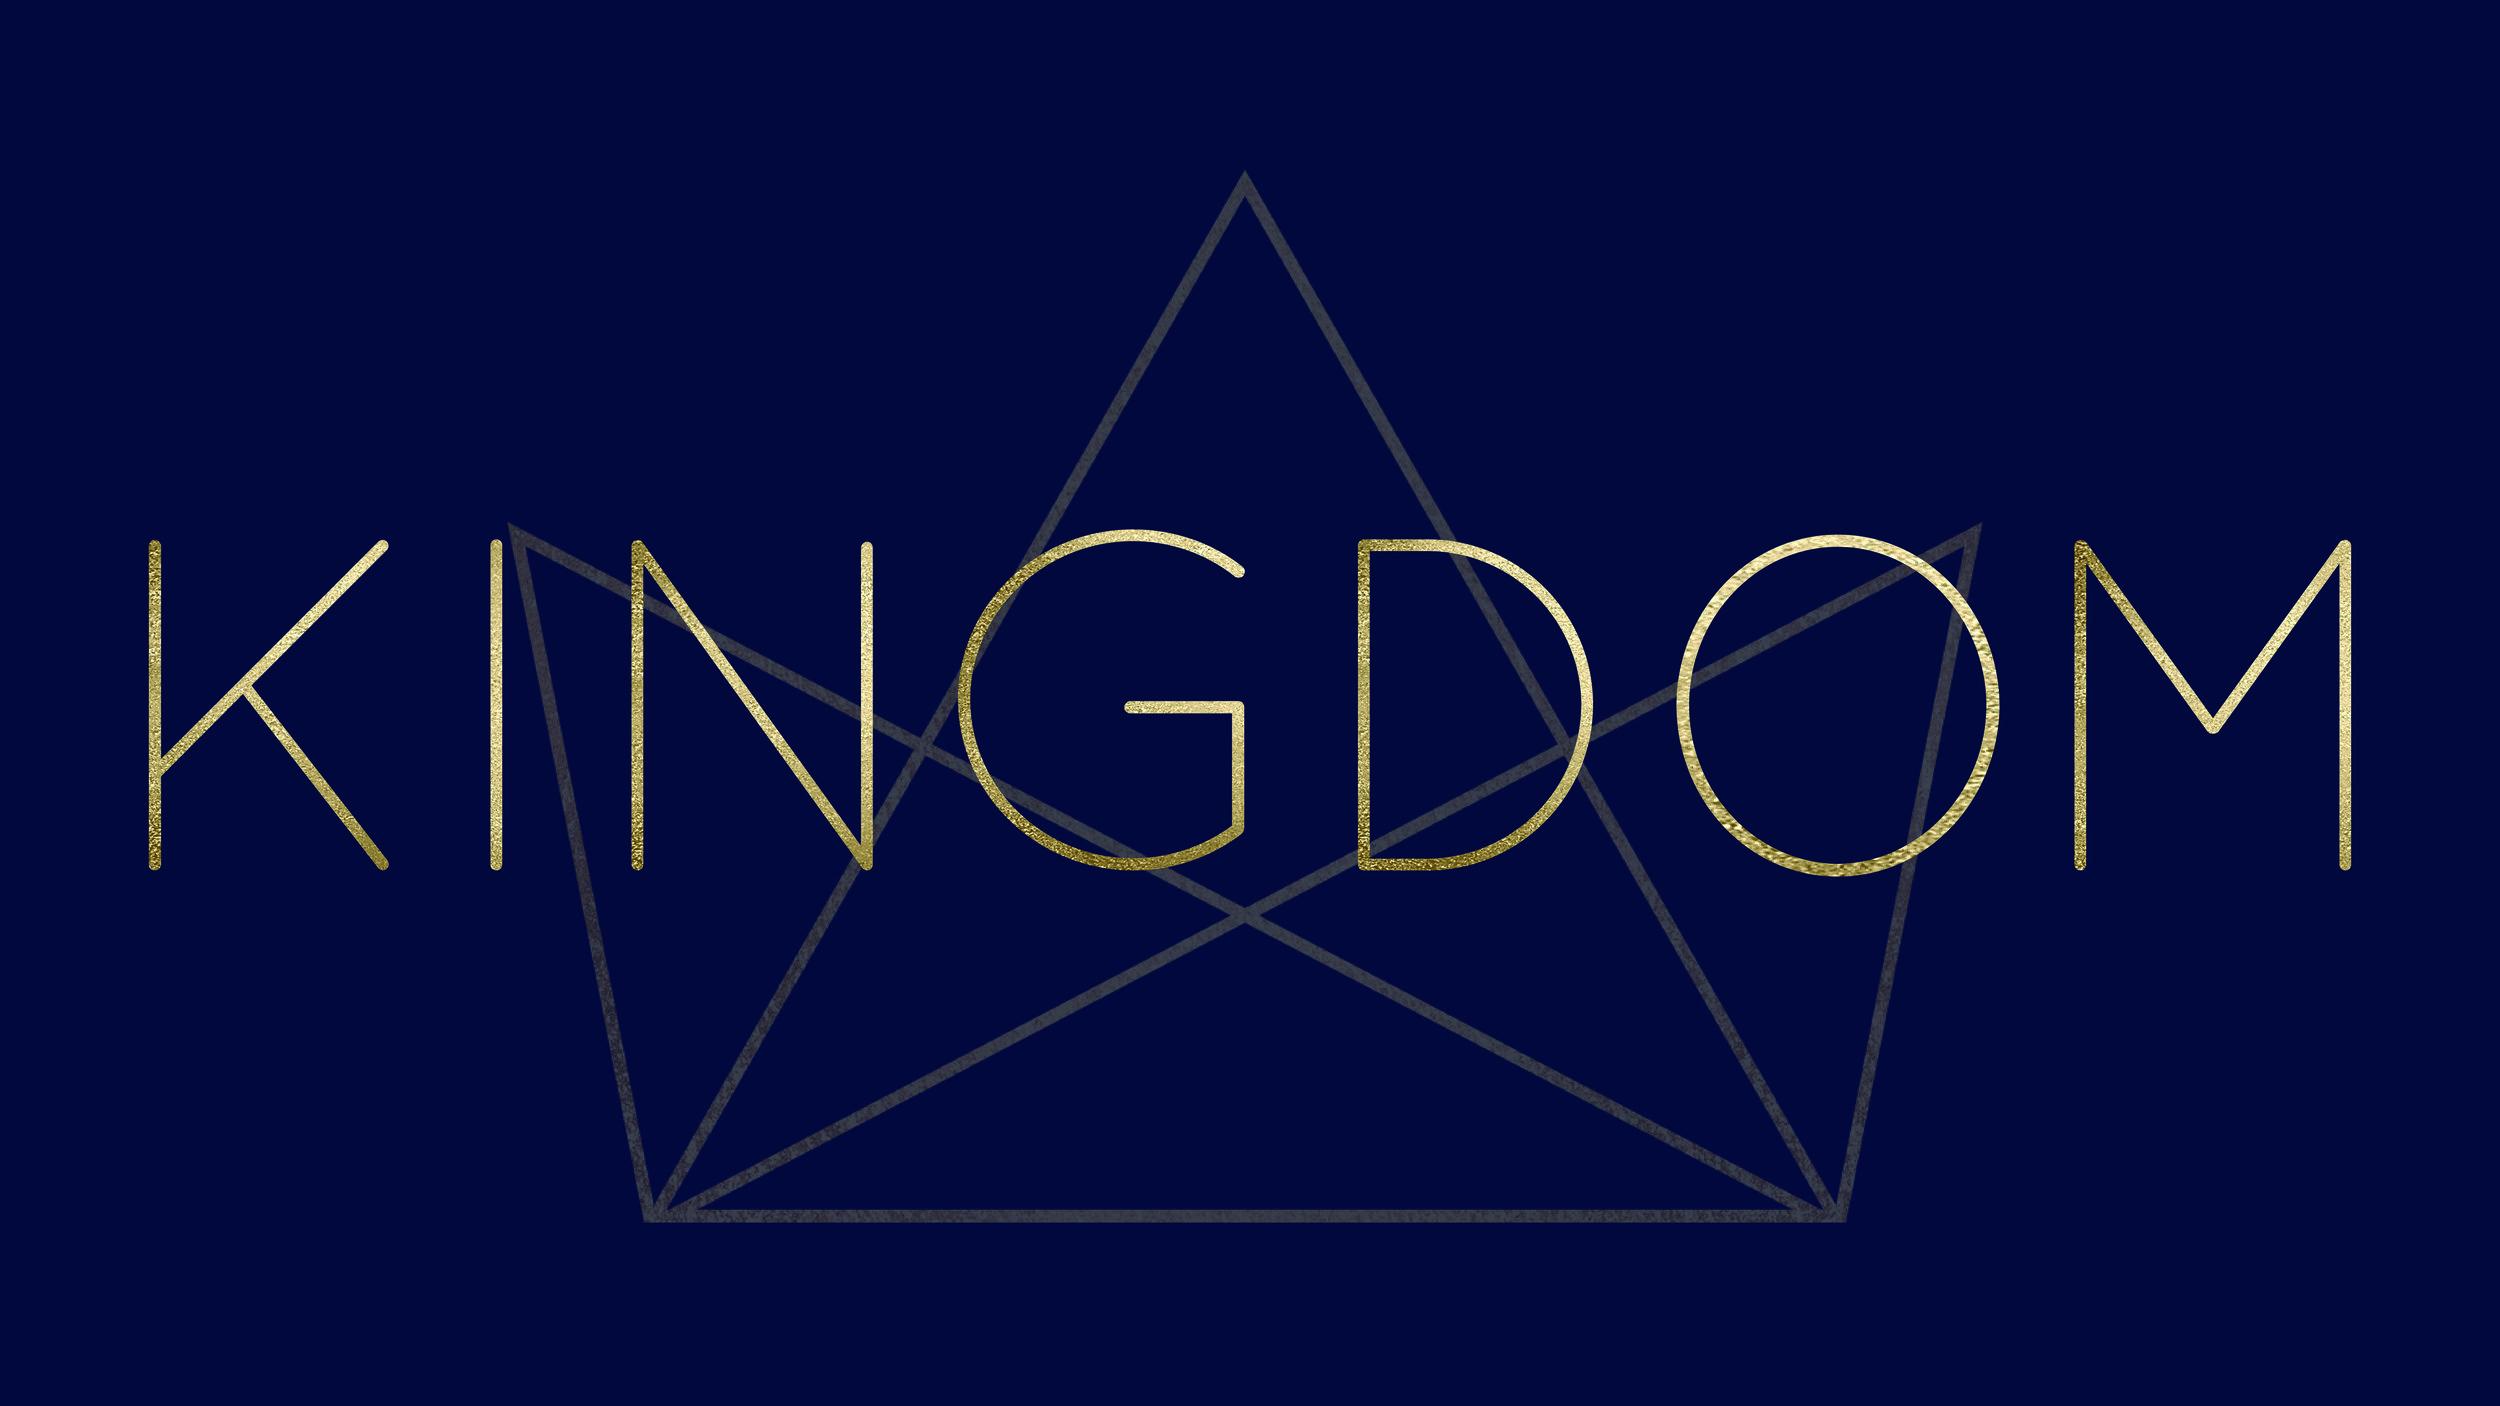 Kingdom - Week 1: Kingdom / Matthew 3:1-3Week 2: Kingdom / Parable of the SowerWeek 3: Kingdom / Micah 5:2 and Matthew 6:9-13